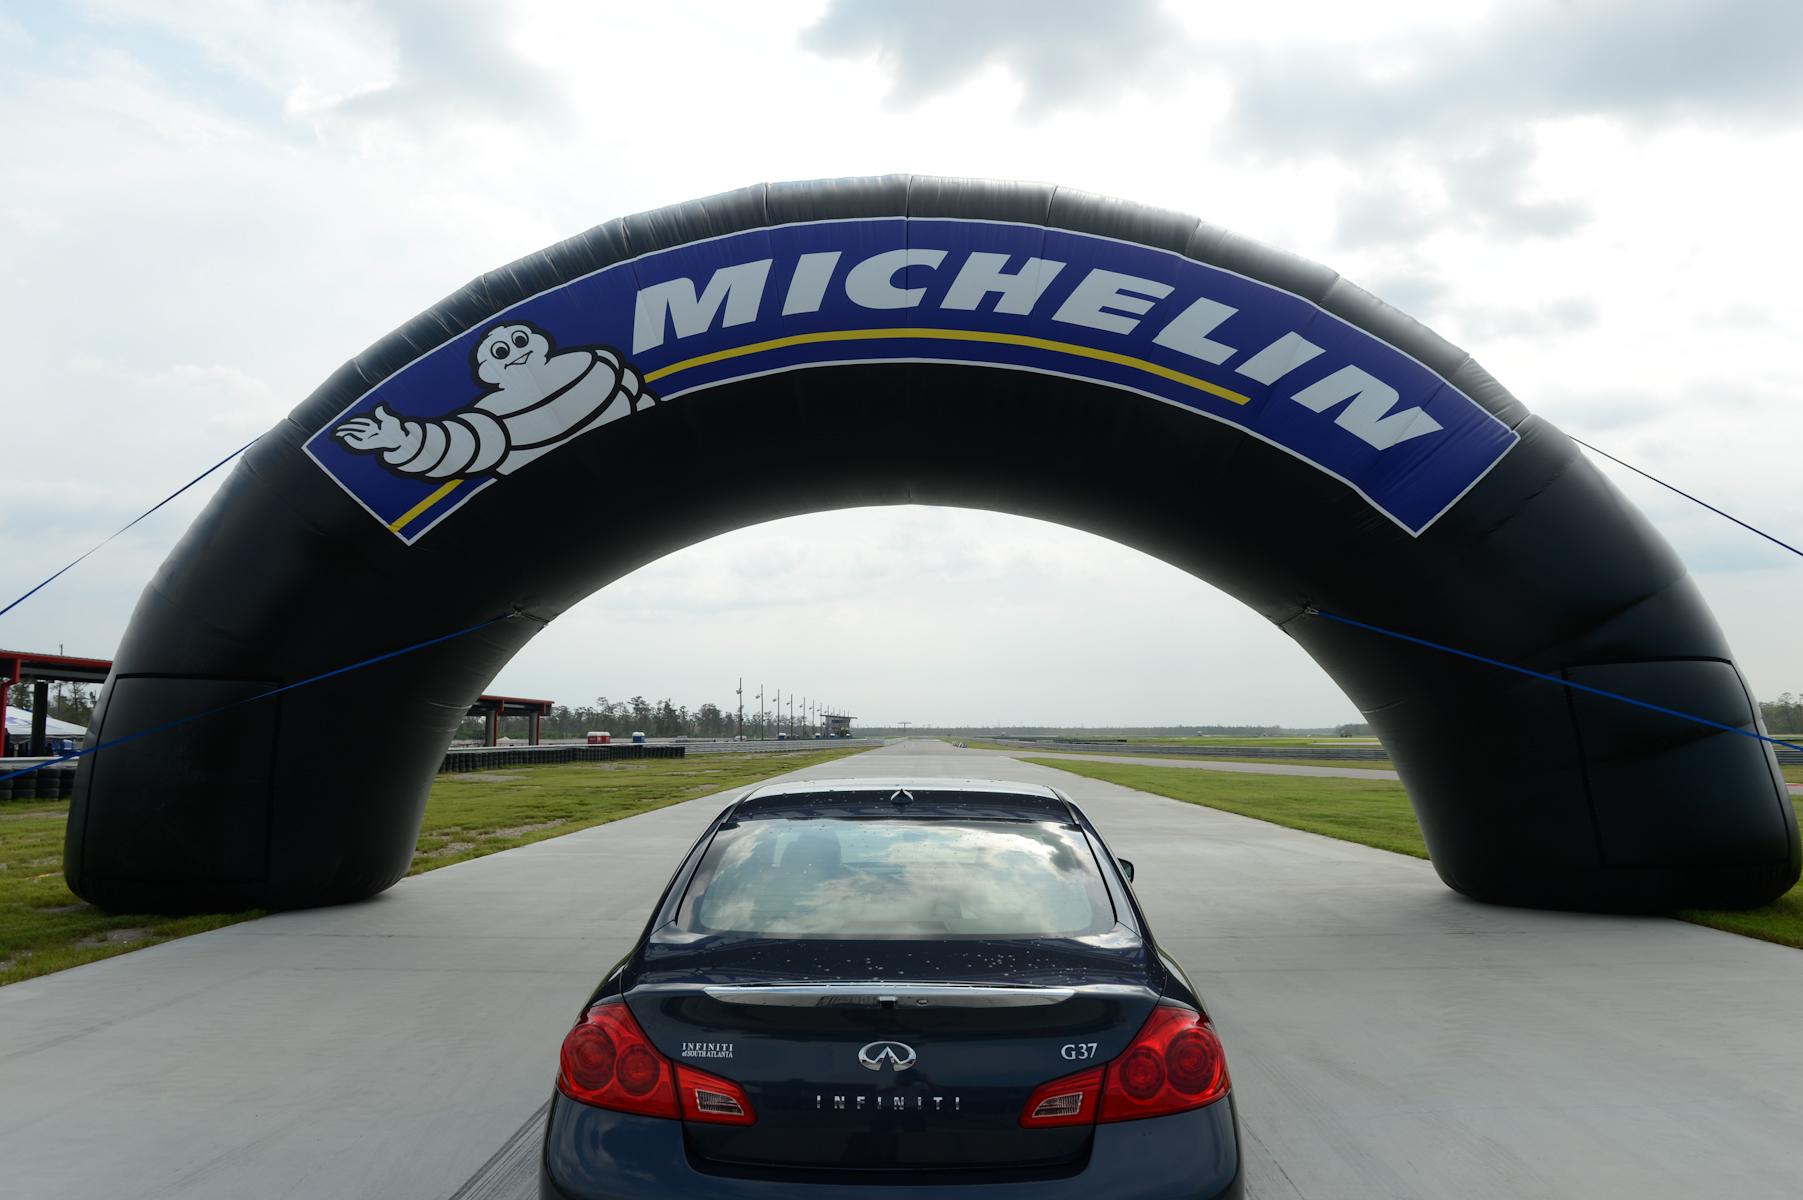 Michelin NOLA Motorsports Park